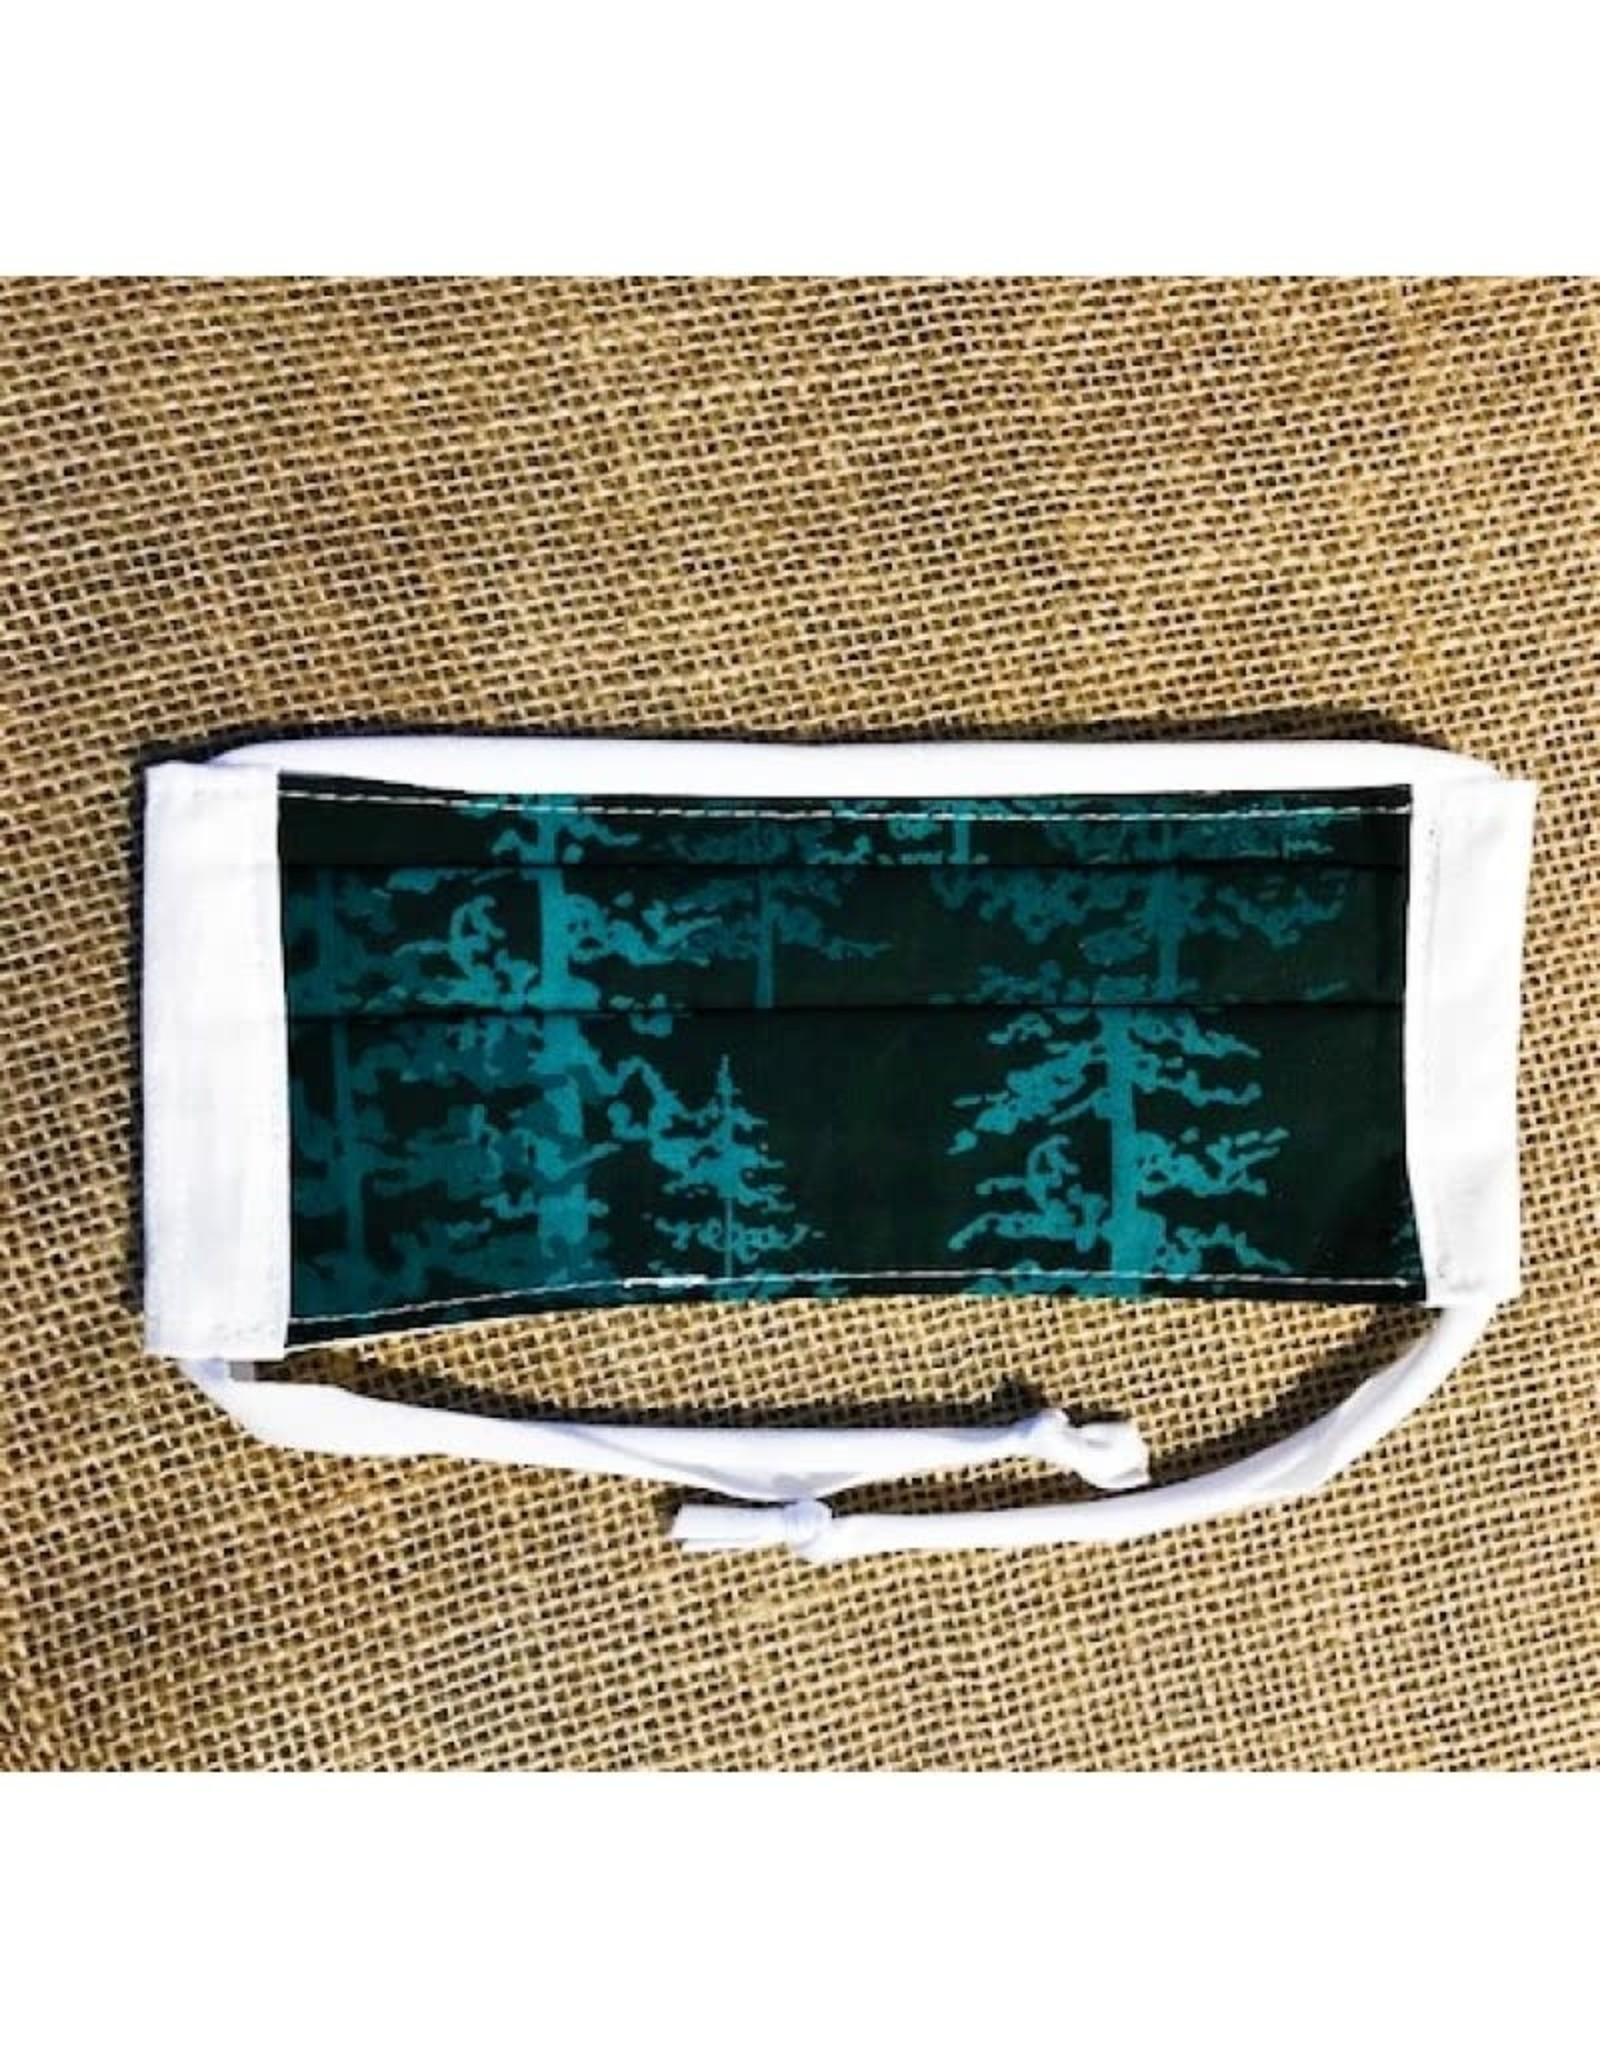 Bear Den Handmade Cotton Mask - Pine Trees